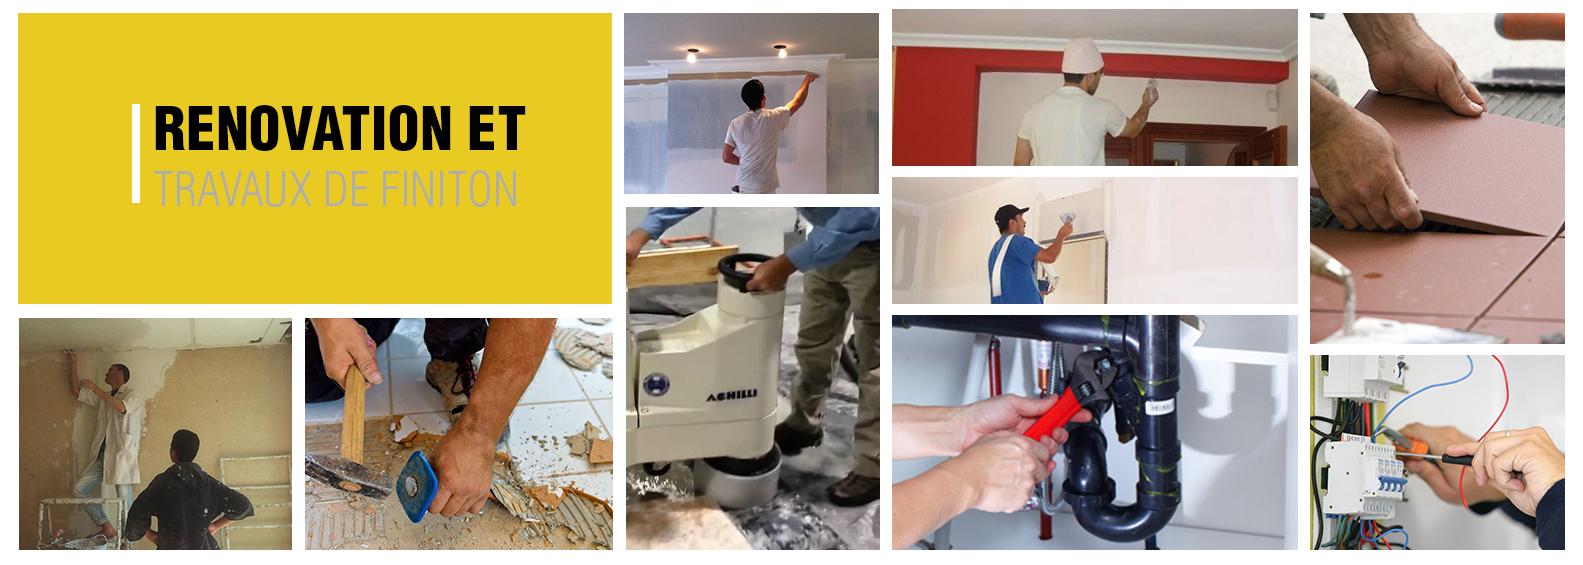 Alidade travaux menuiserie aluminium travaux second for Travaux et renovation